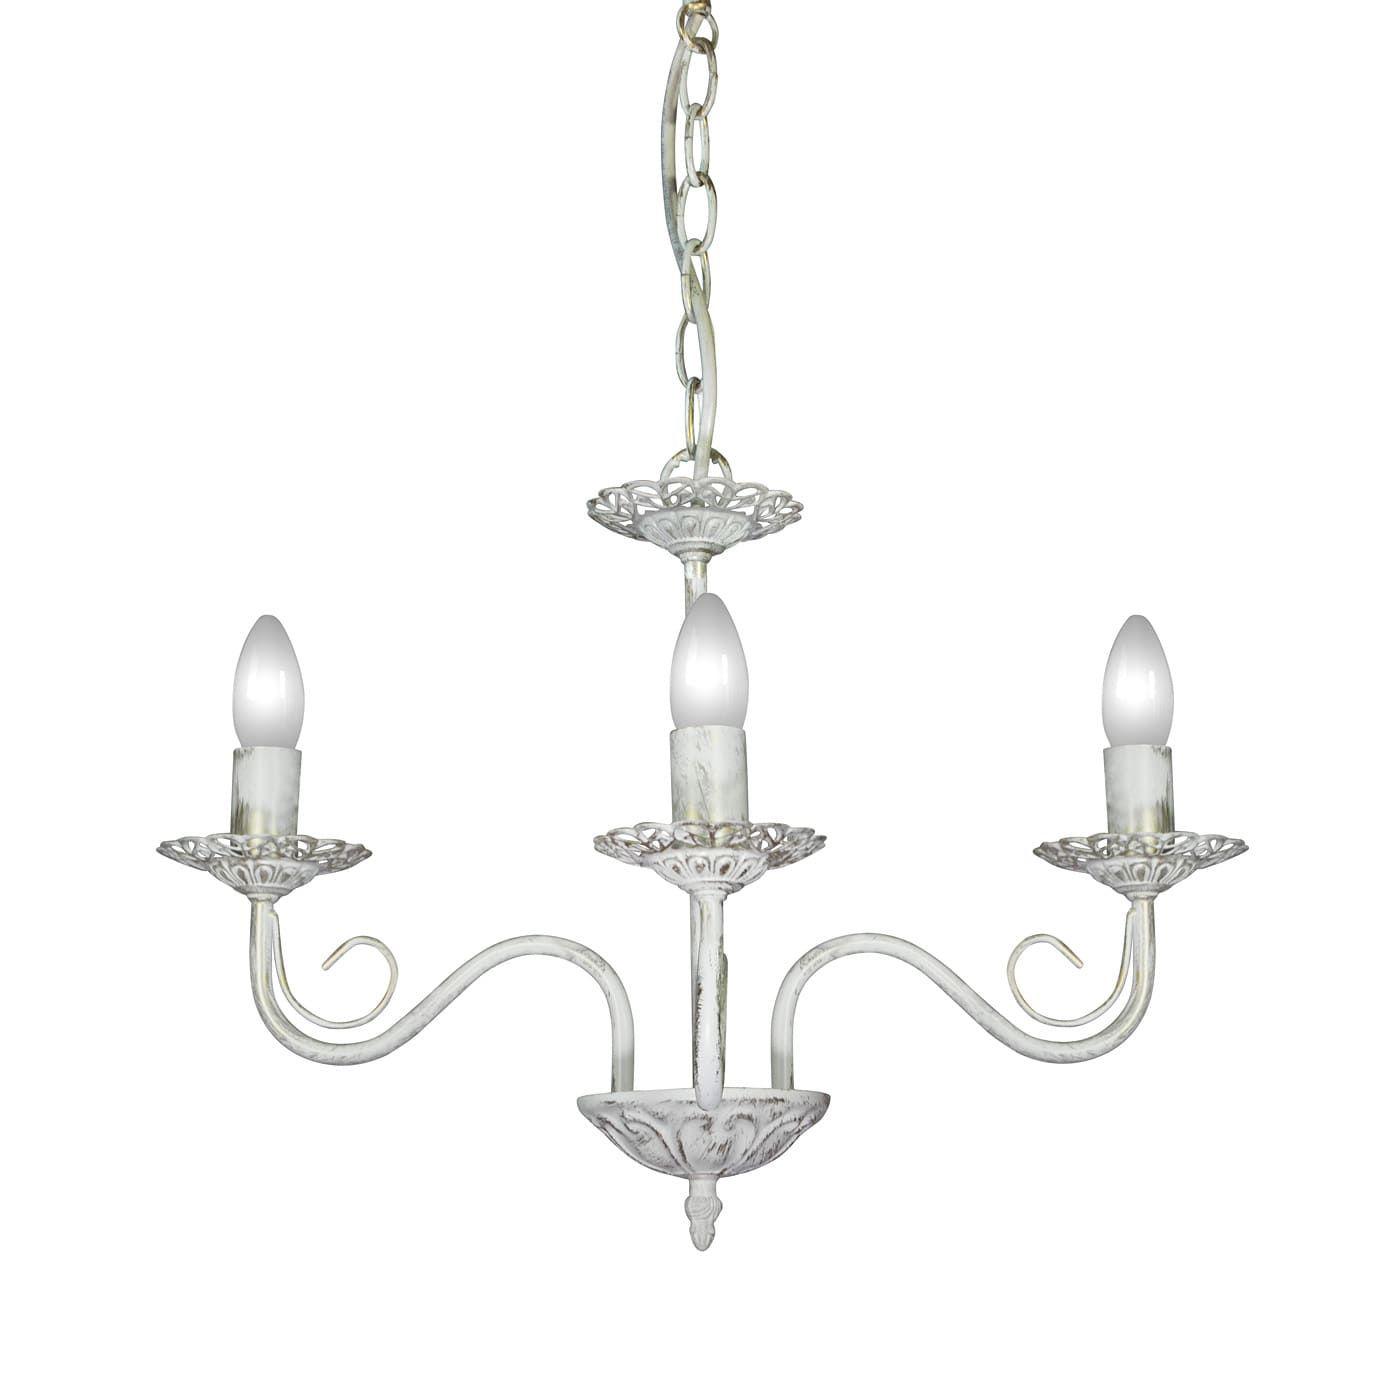 PETRASVET / Pendant chandelier S1158-3, 3xE14 max. 60W